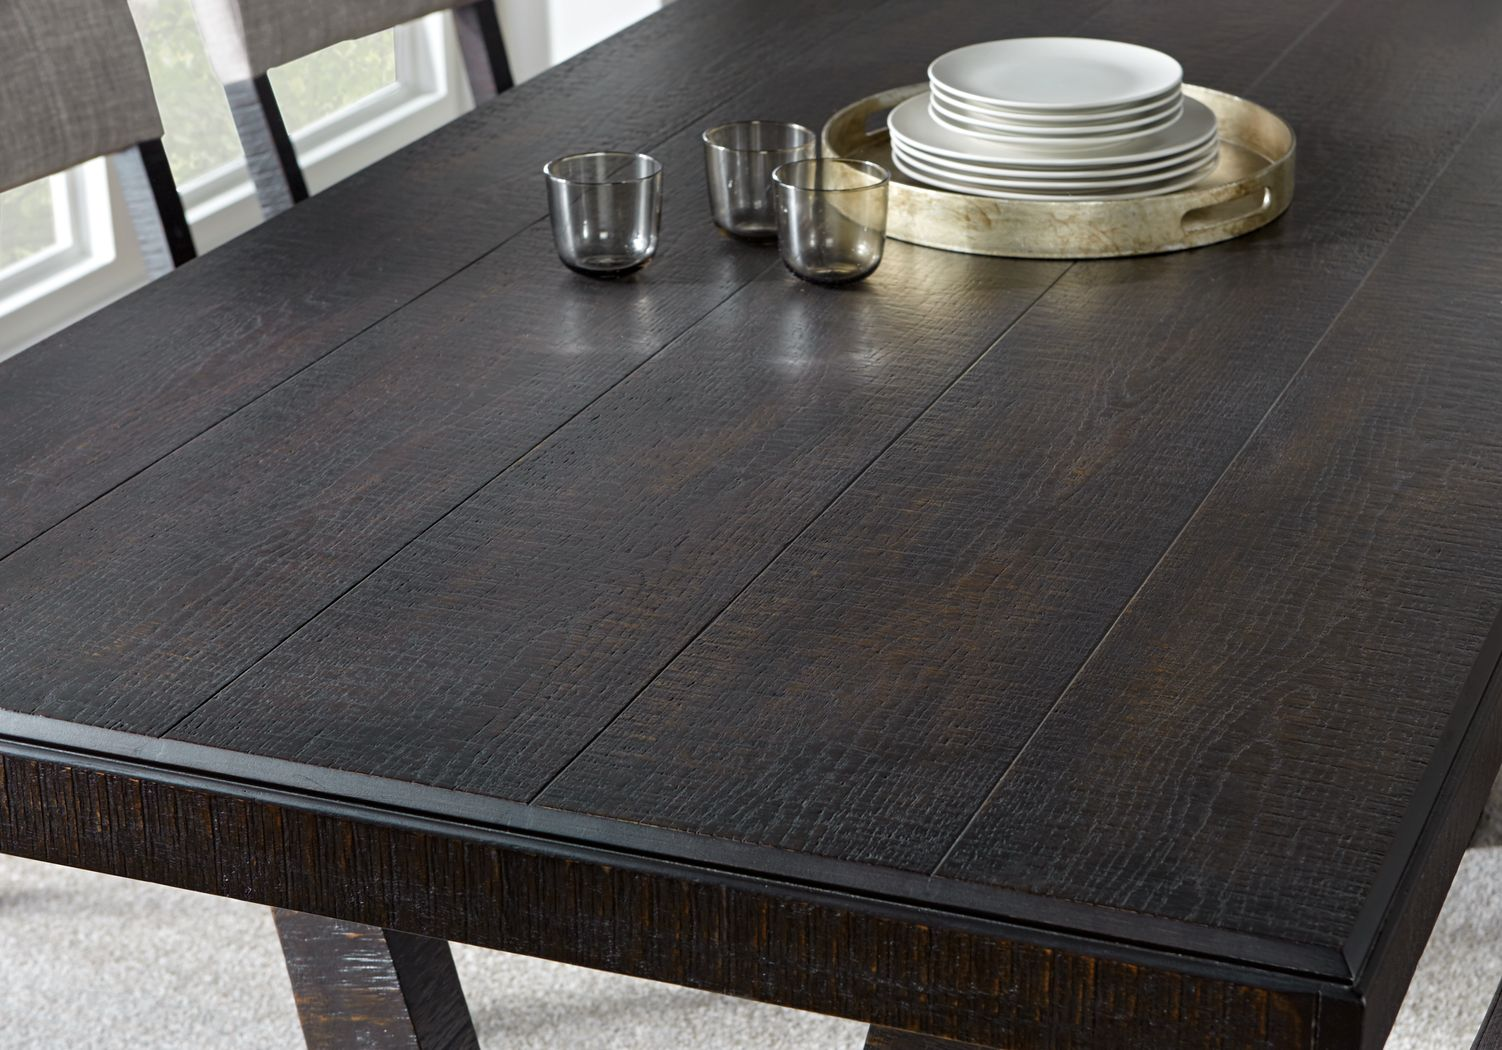 Black Rectangle Tables